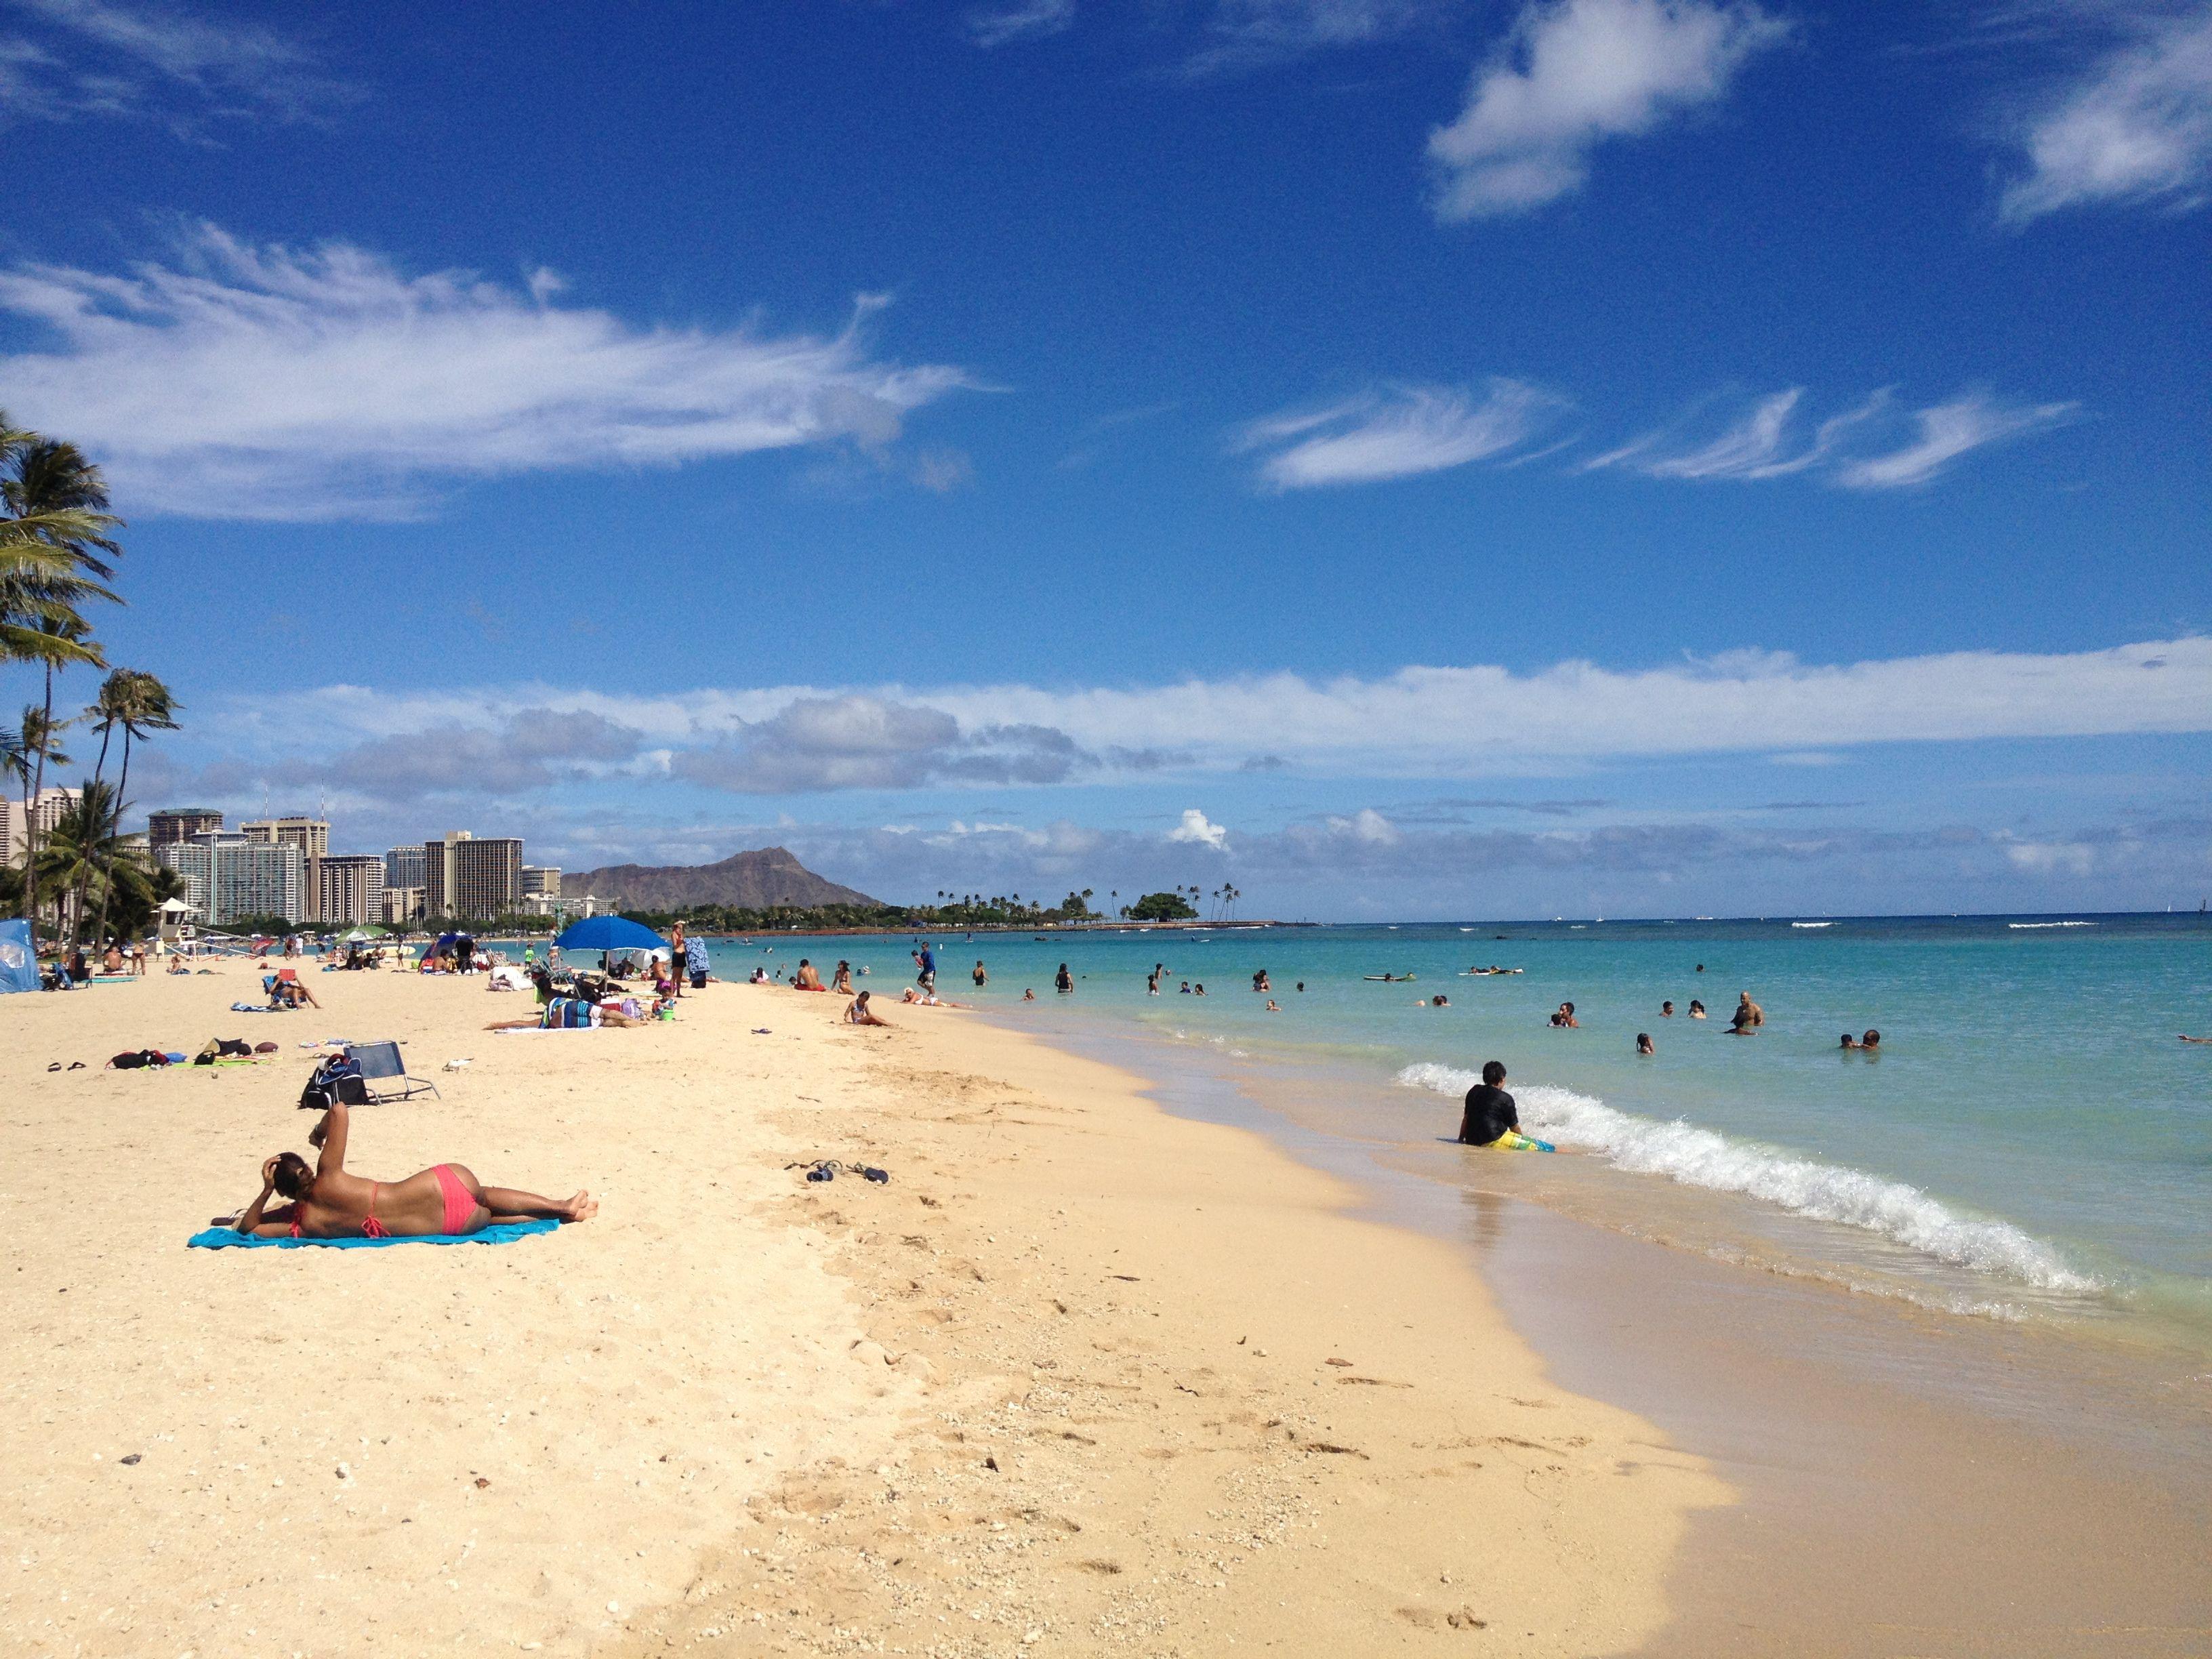 I love the beach! #alamoana #beach #hilife #hawaii